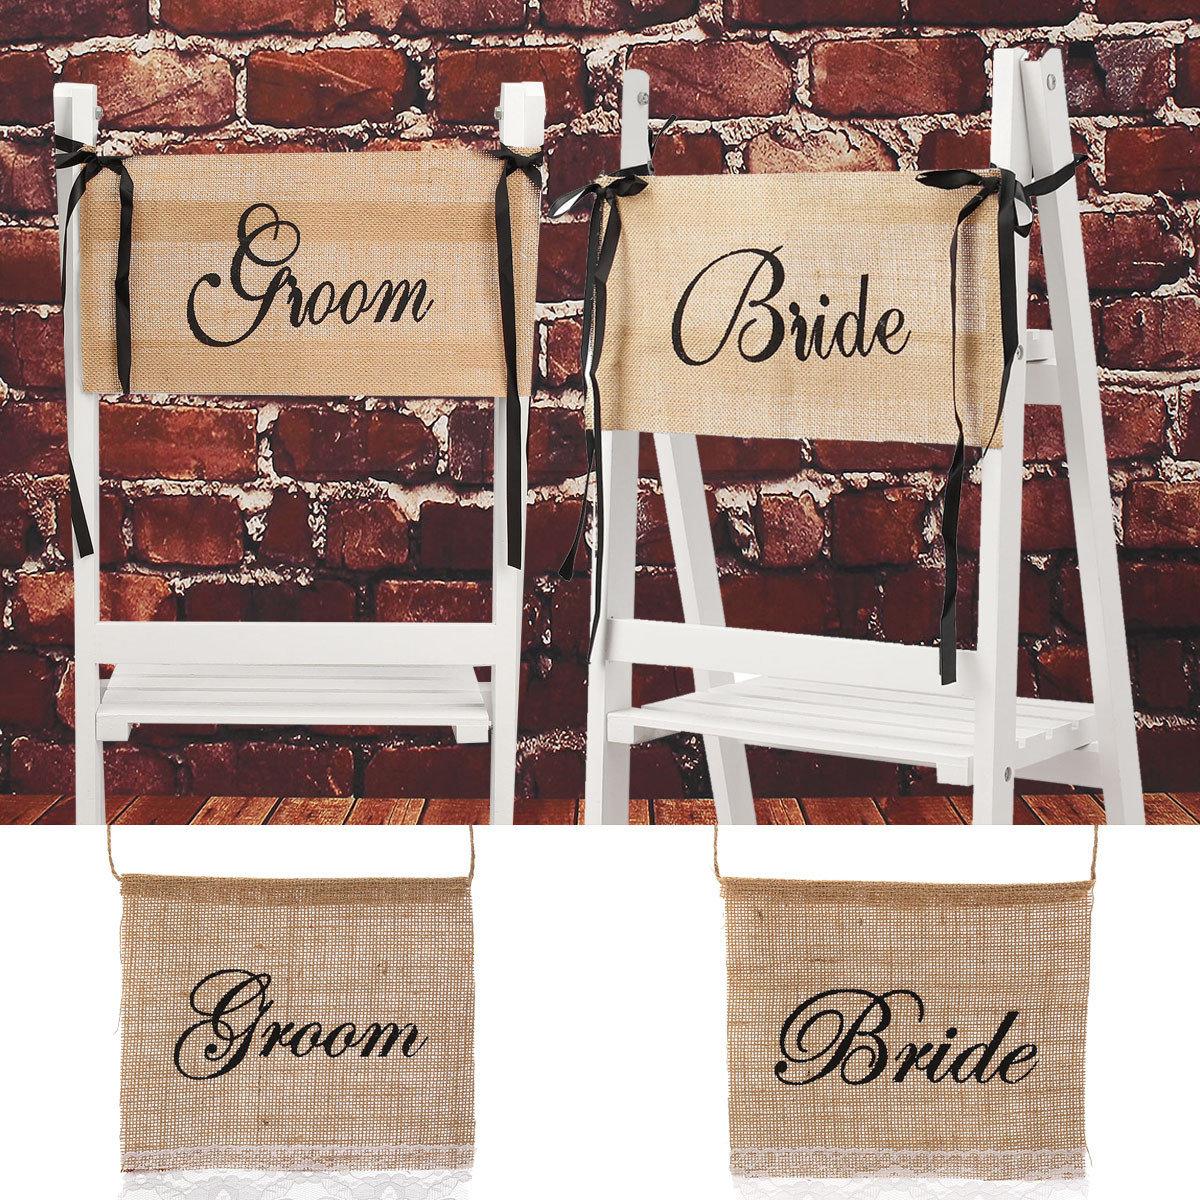 Bride Groom Wedding Chair Bunting Hessian Burlap Banner Party Decoration